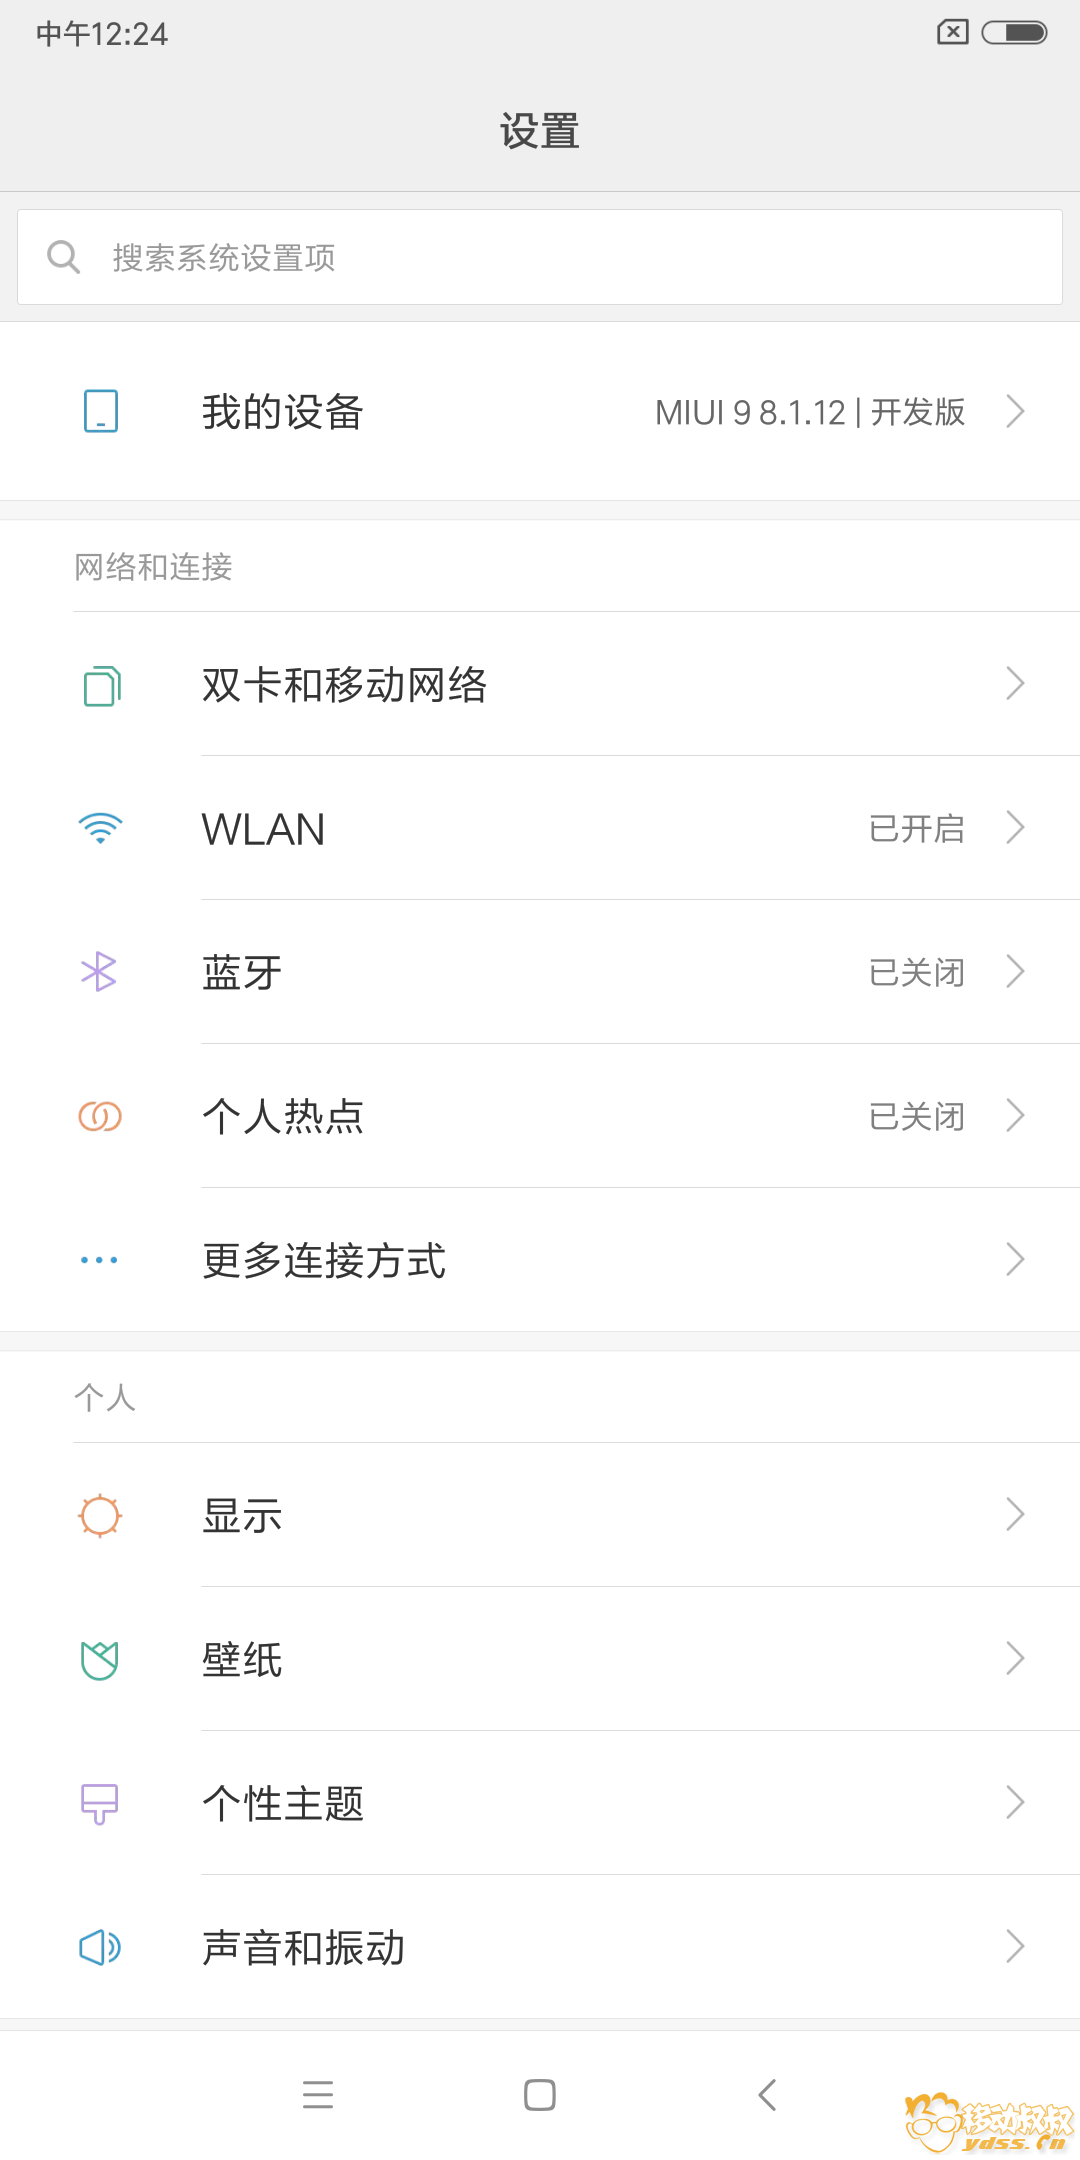 Screenshot_2018-01-12-12-24-19-370_com.android.settings.png